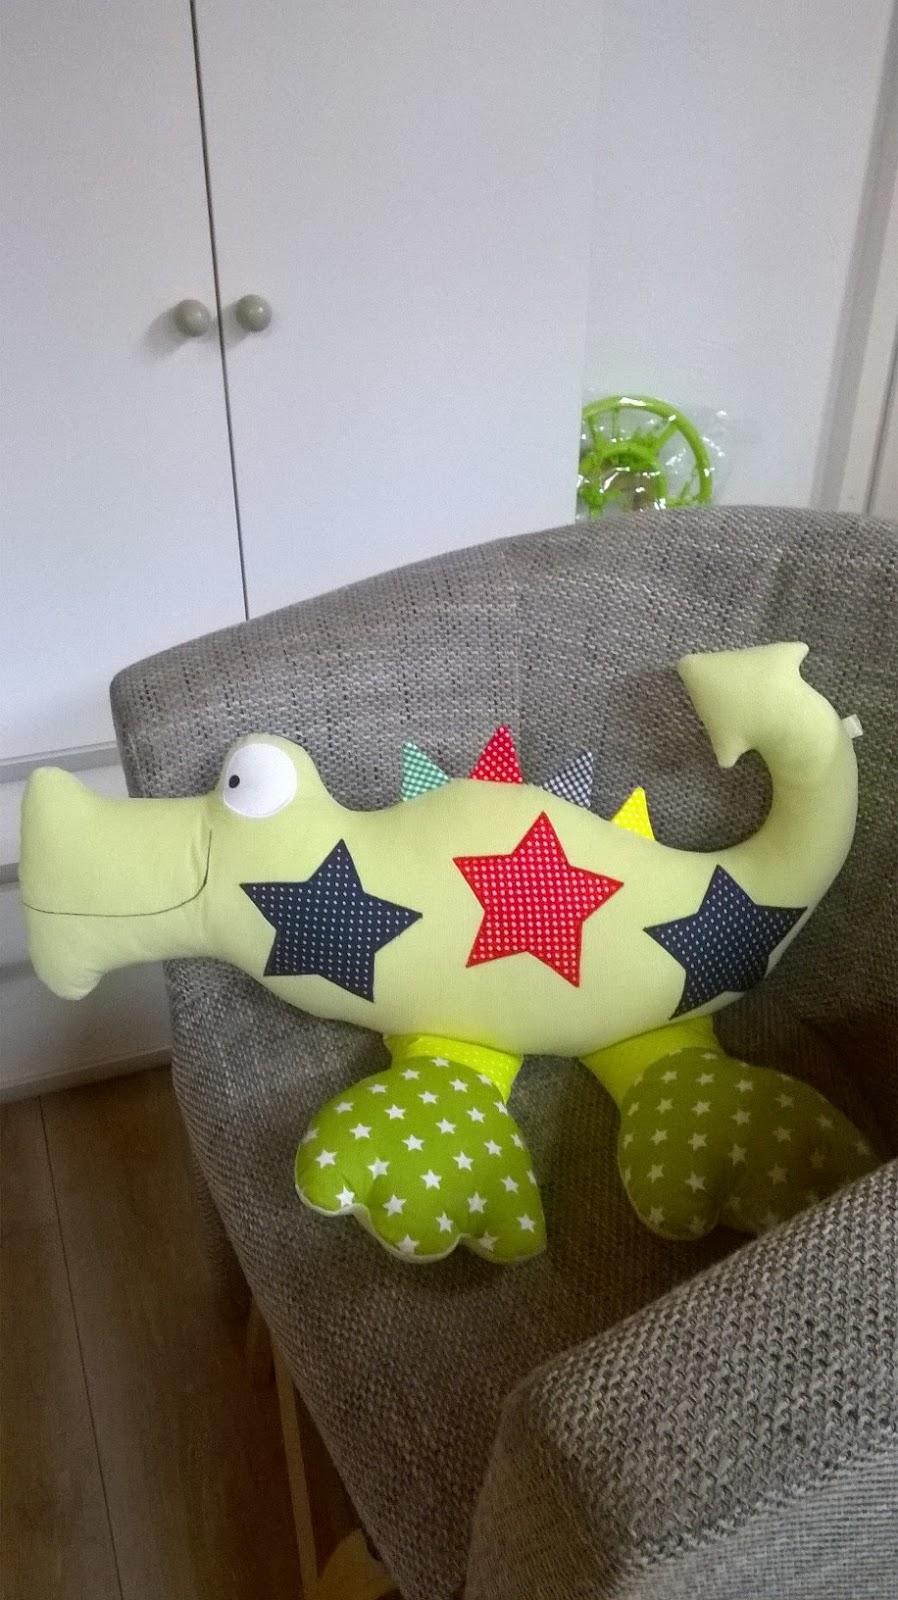 Strickenundnaehen: Krokodil